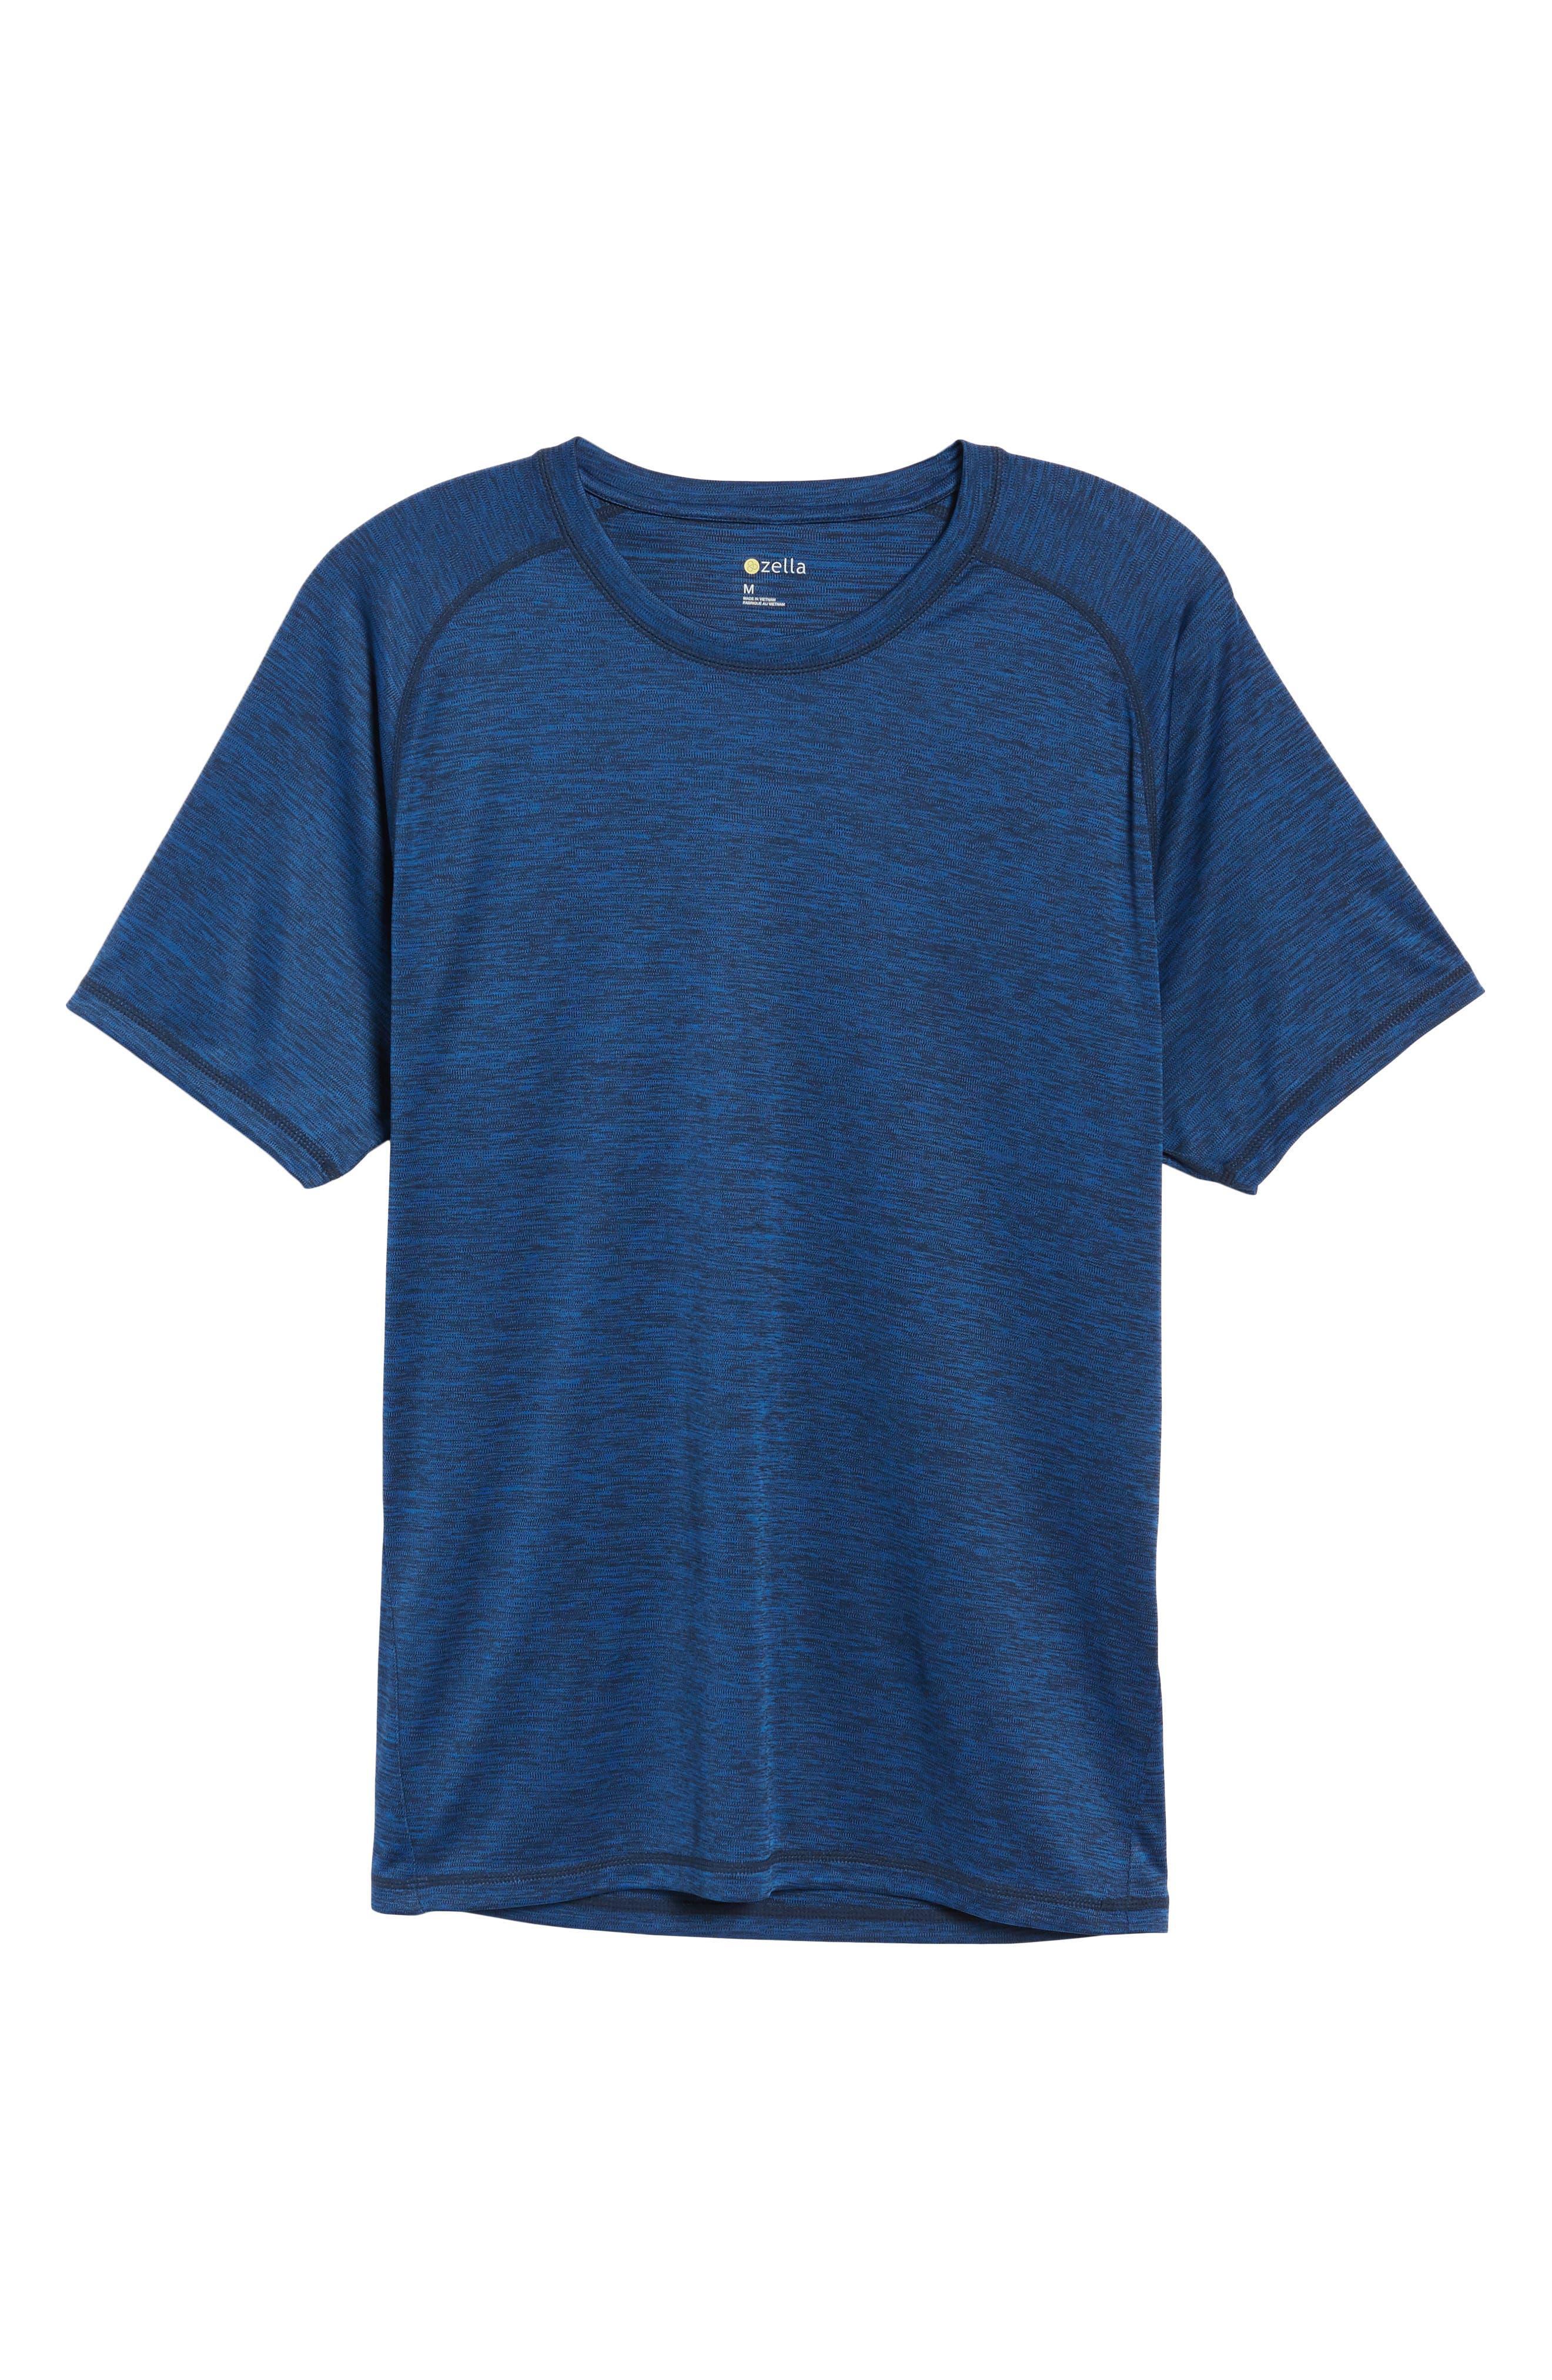 Triplite T-Shirt,                             Main thumbnail 1, color,                             Navy Malachite Melange